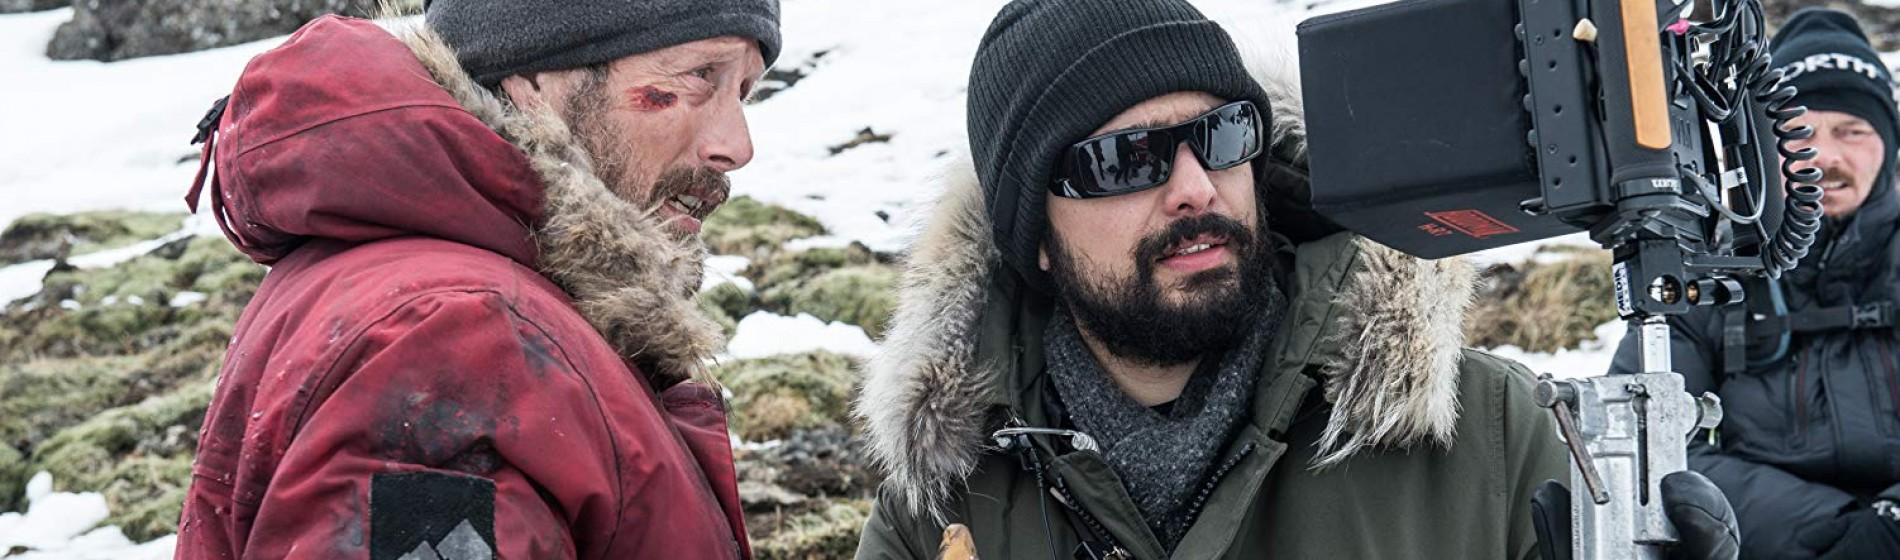 Arctic Mads Mikkelsen Joe Penna